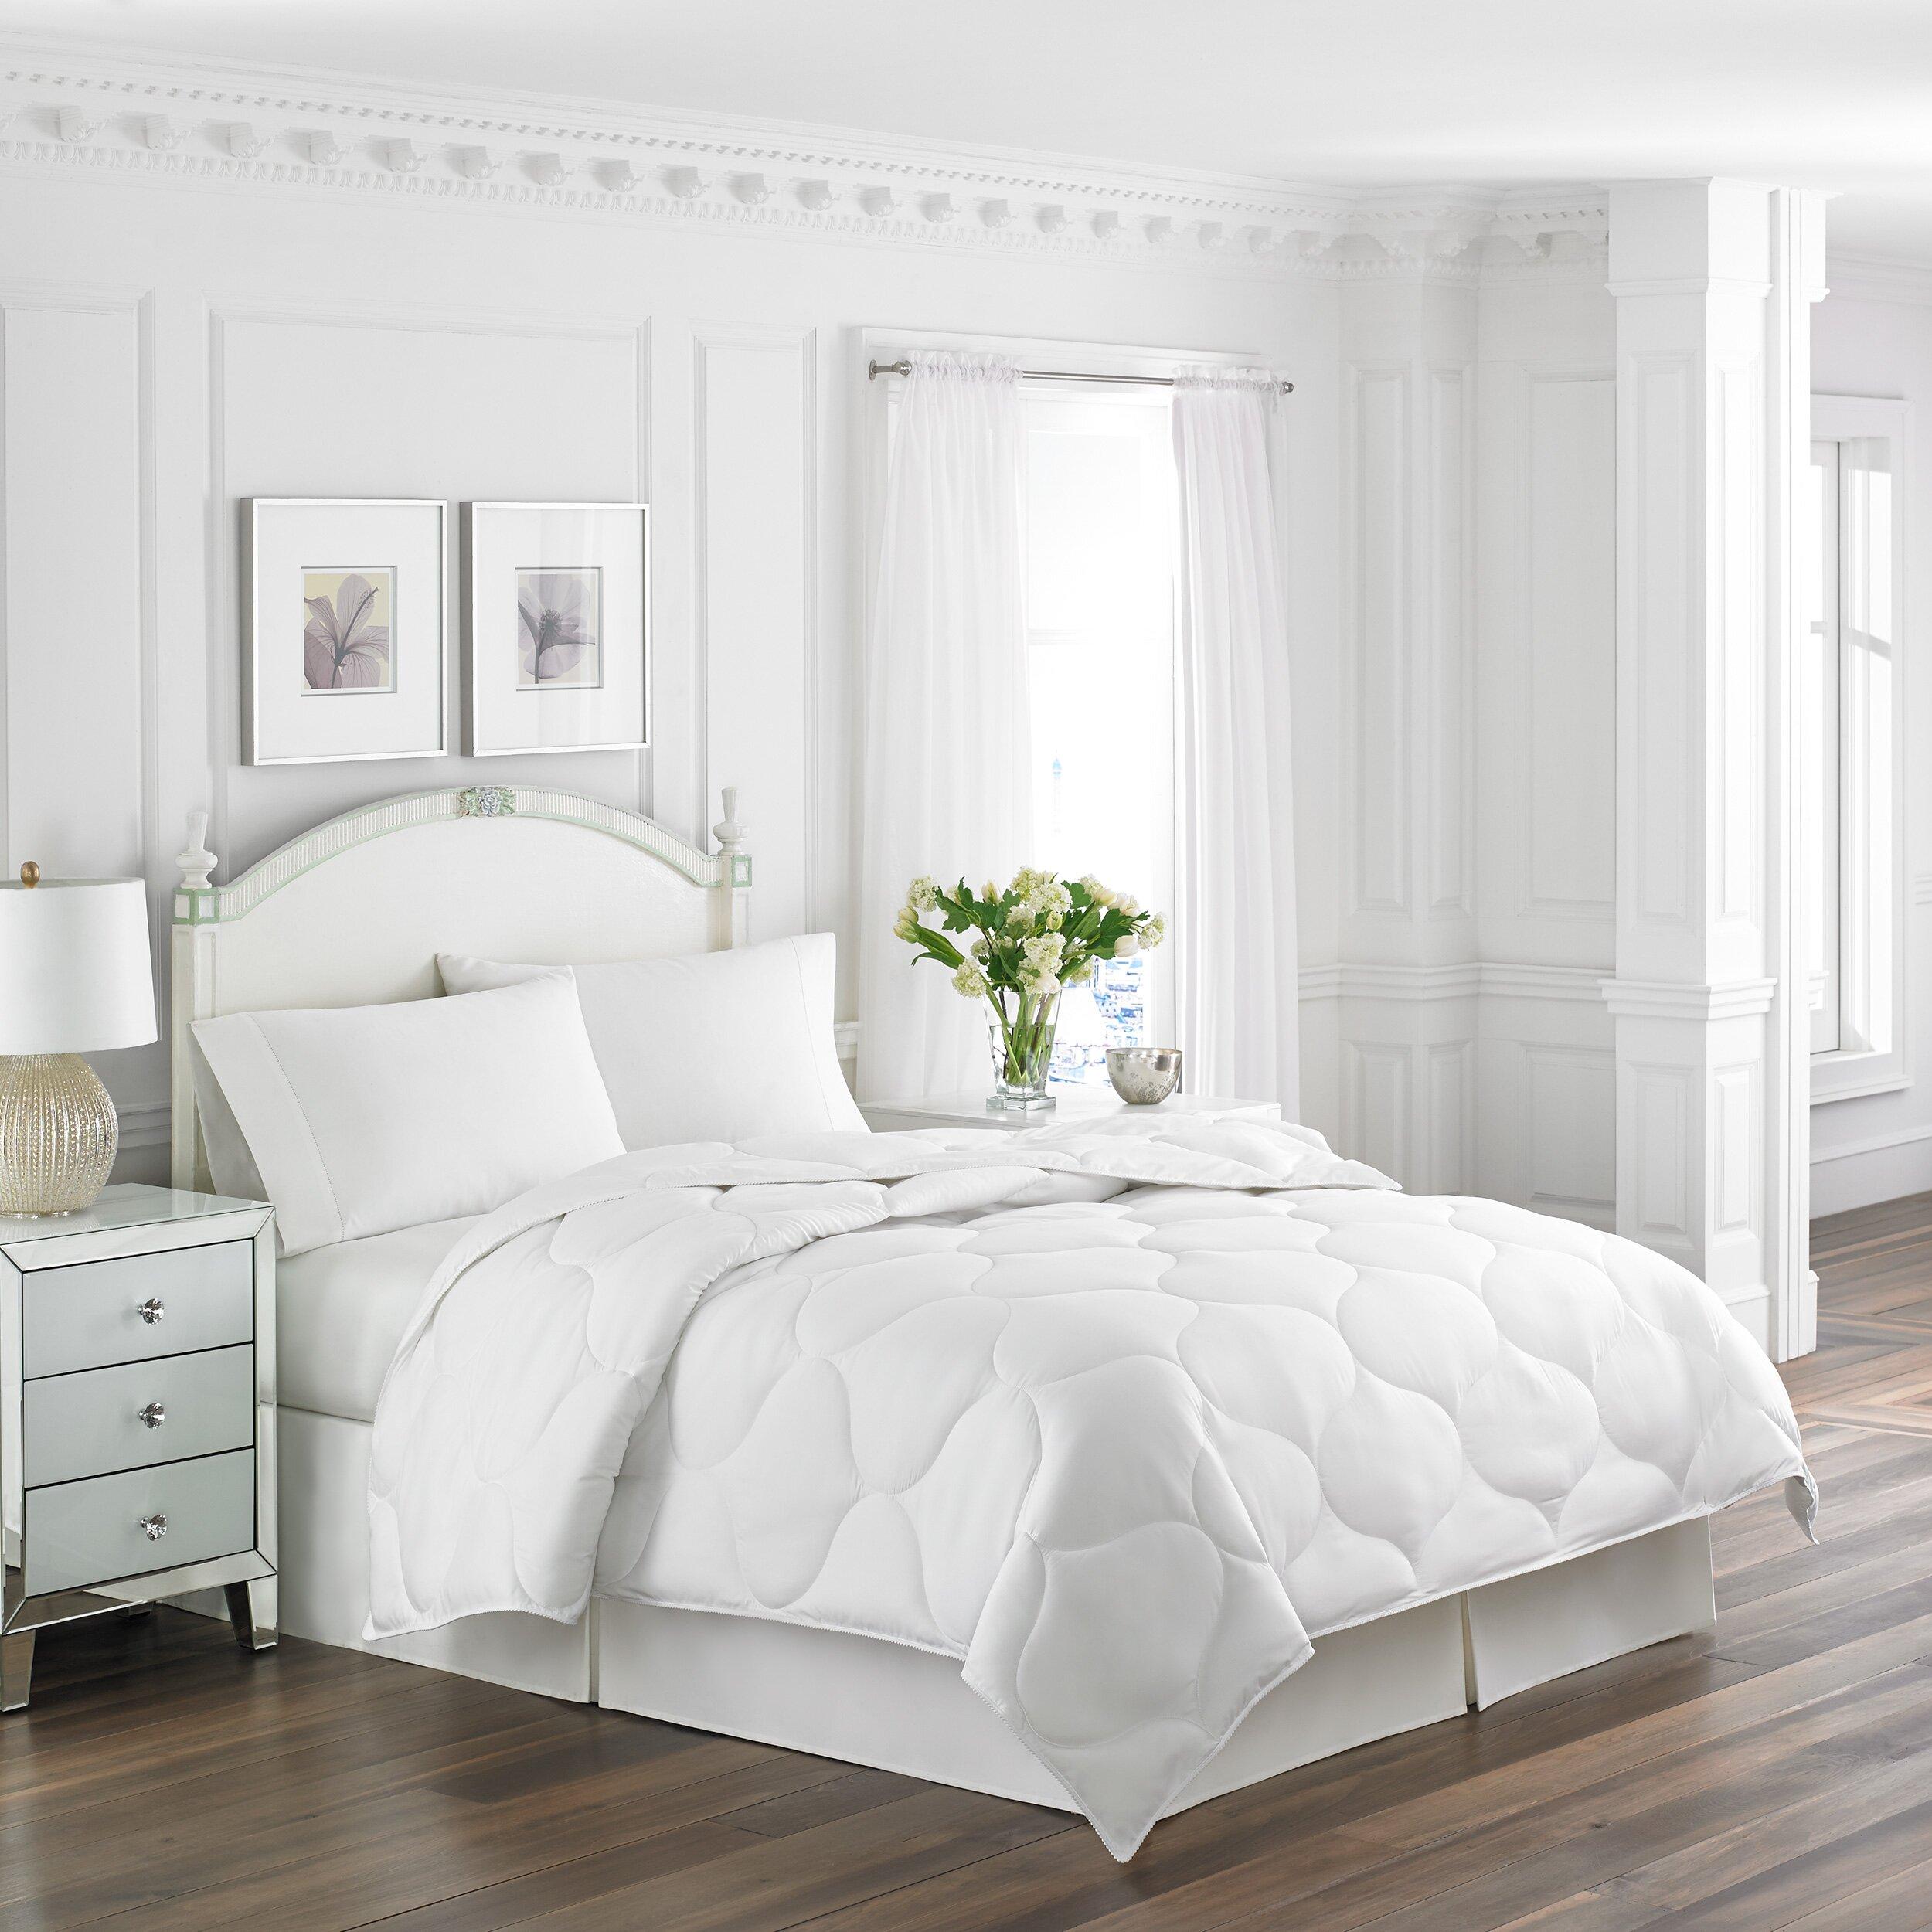 home design down alternative comforter home and 20 best comforters reviews down alternative comforter